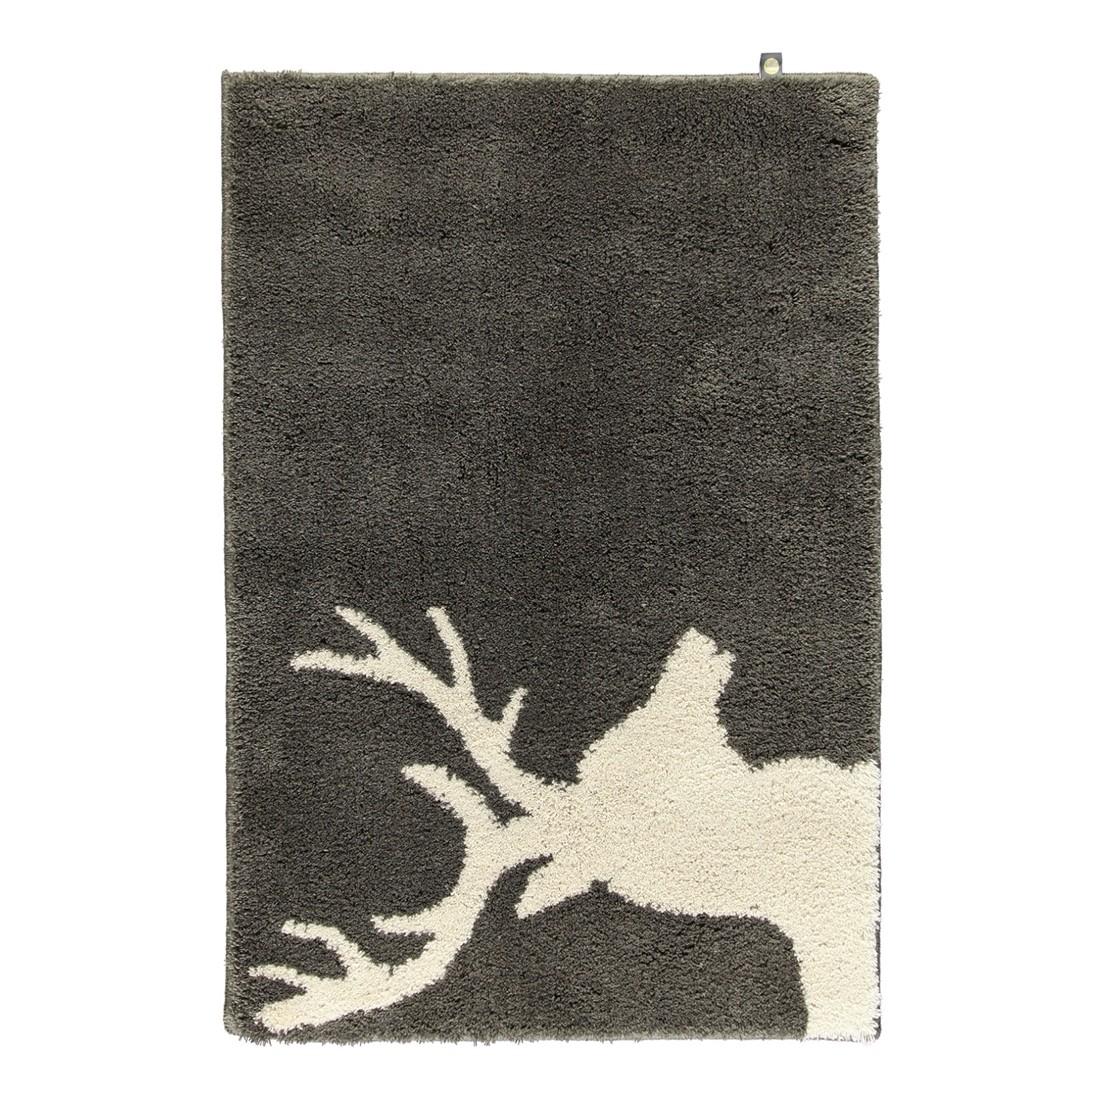 Badteppich Lord – 100% Polyacryl moor/- Stone – 1314 – 70 x 130 cm, Rhomtuft online bestellen